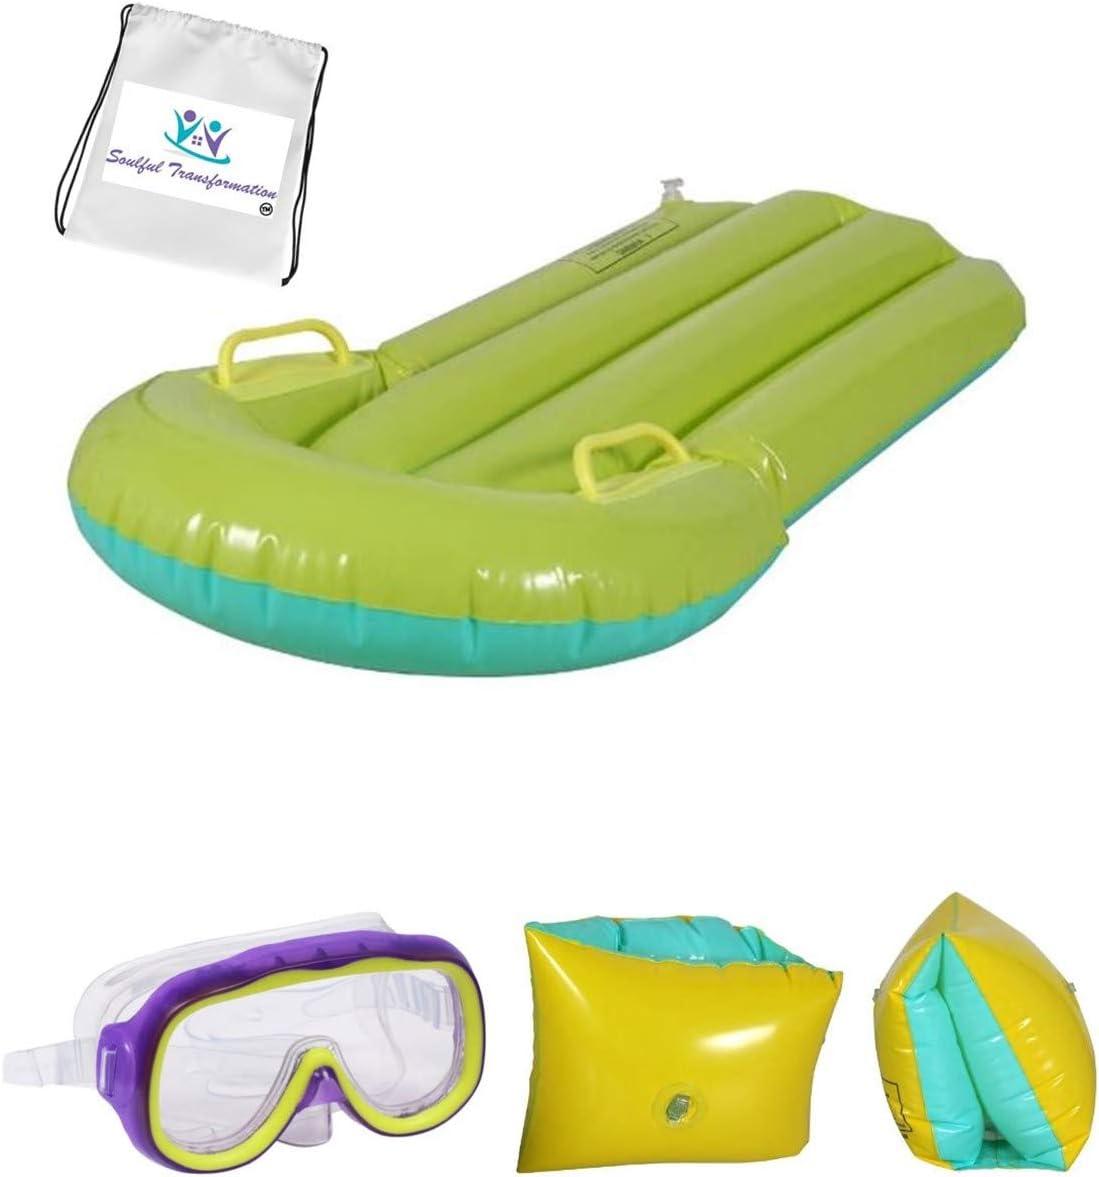 Bonus Exclusive ST Days of Fun Activity Book TM Kids Spring Summer Swim Backyard Outdoor Green Kickboard Arm Float /& Swim Mask Bundle of 3